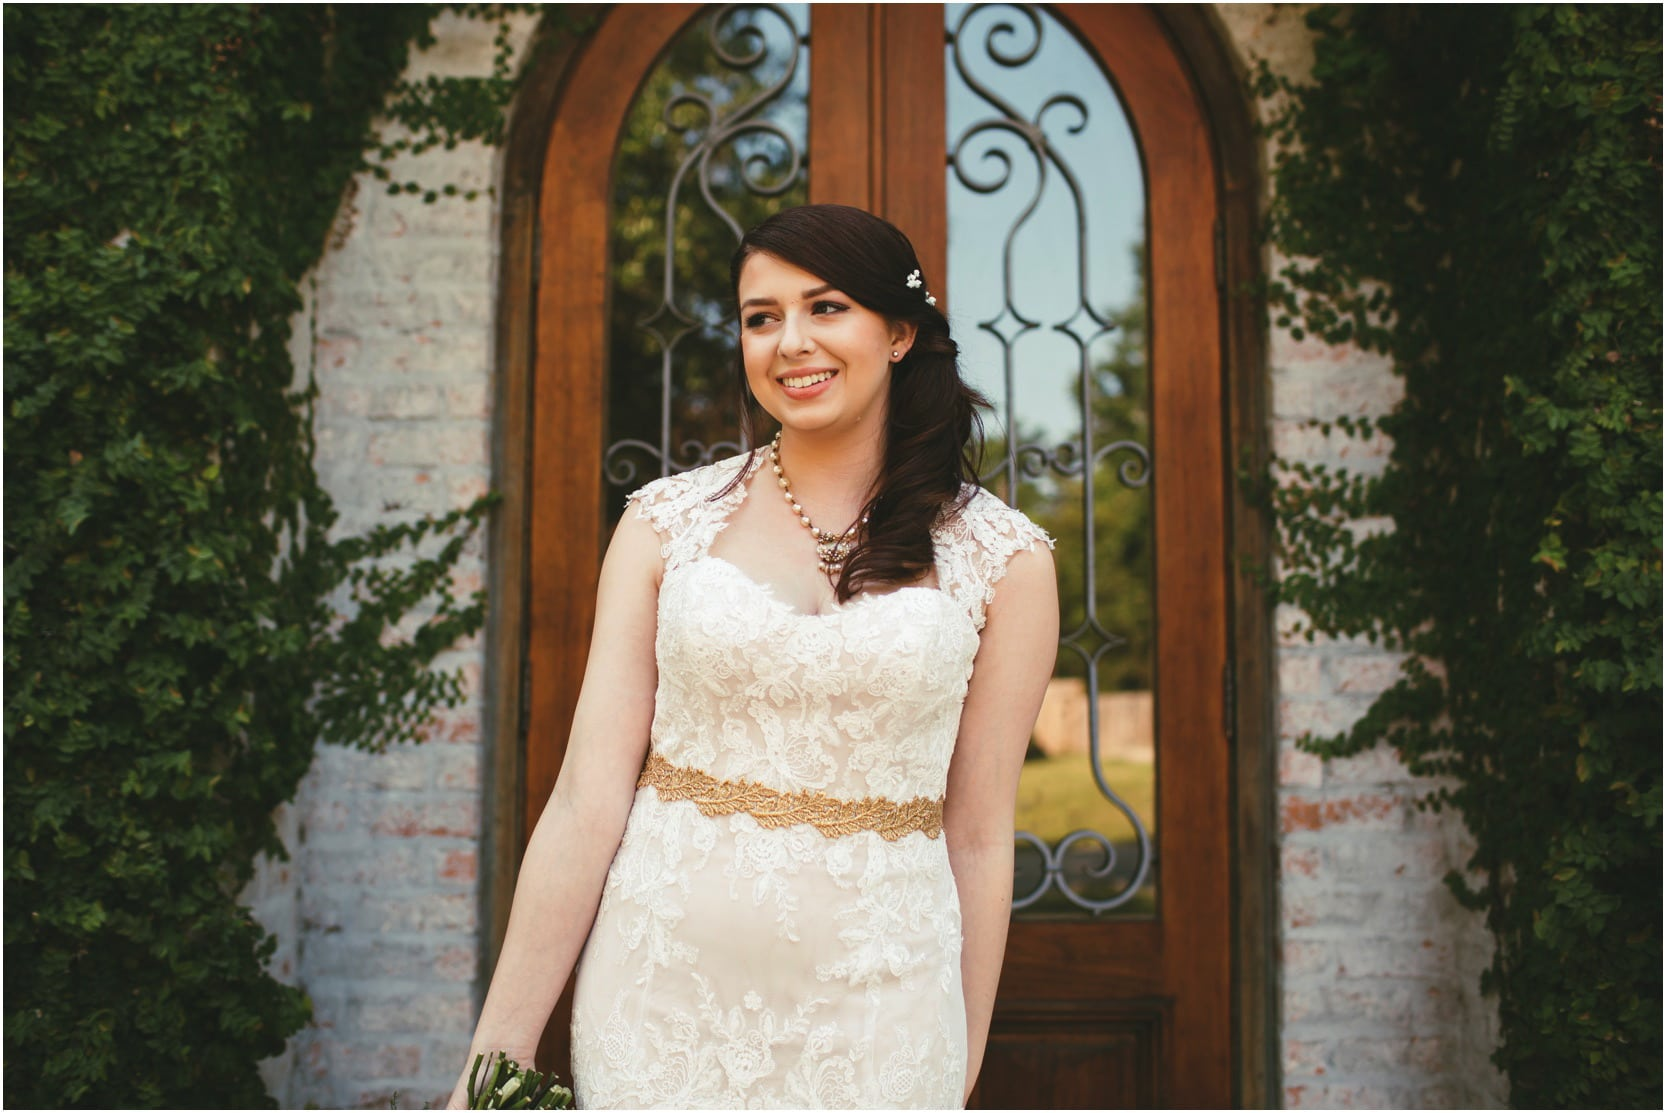 naomijacob_covington_wedding__135_blogstomped